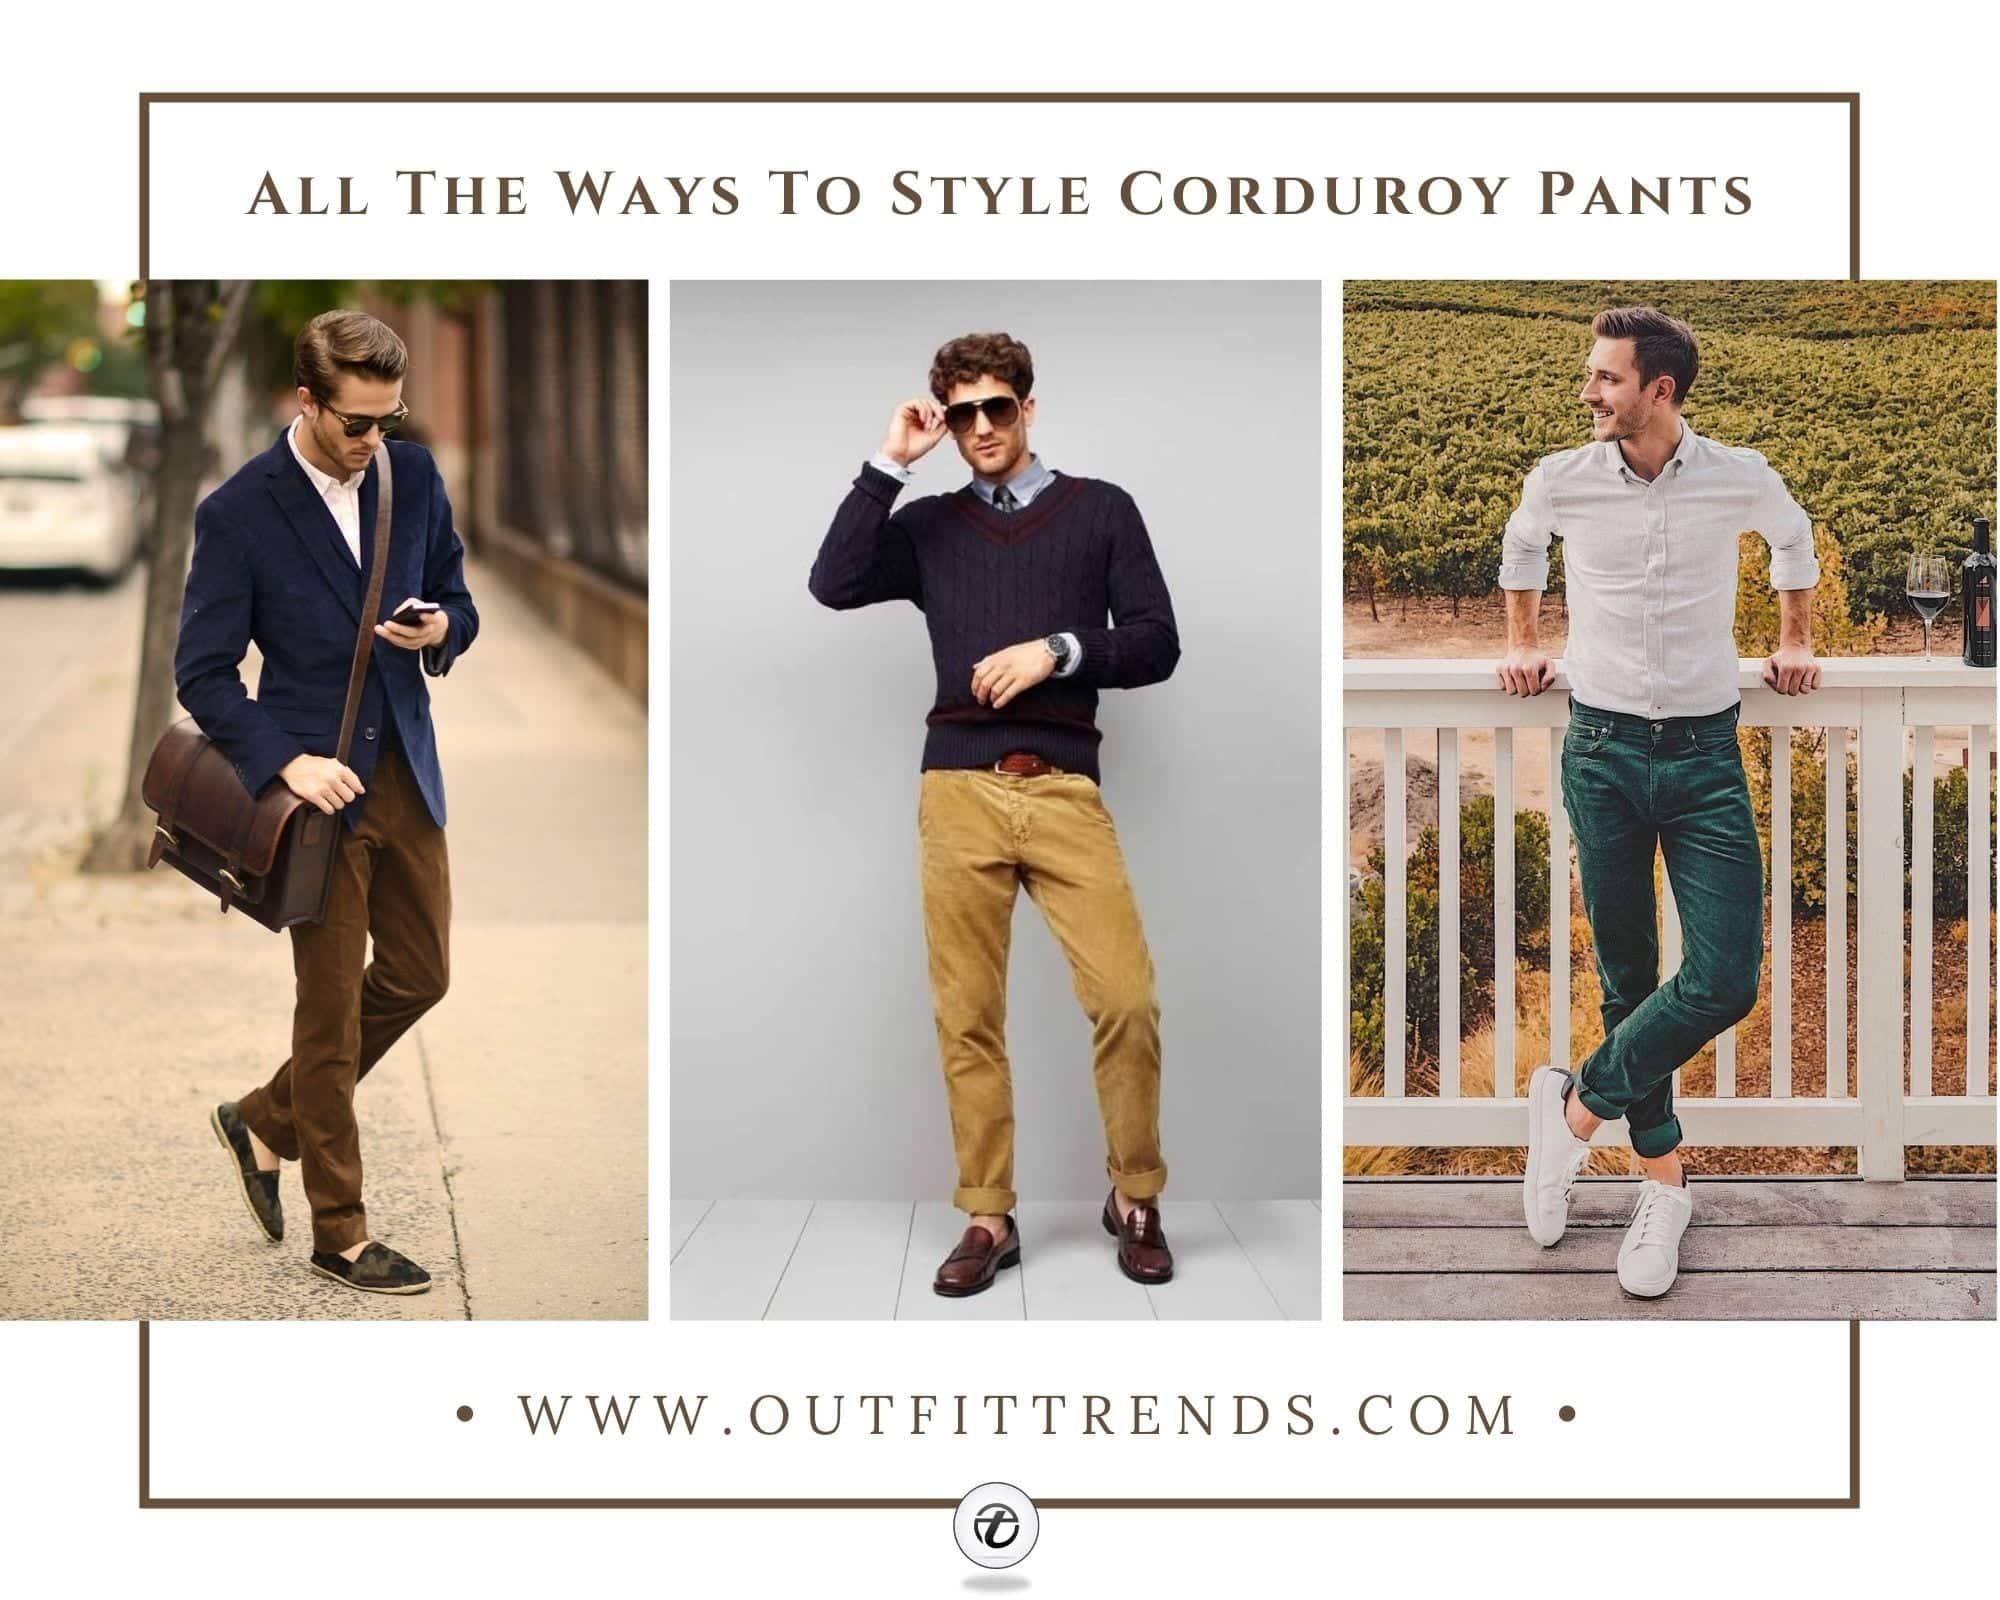 Mens Corduroy Pants Outfits 26 Ways to Wear Corduroy Pants